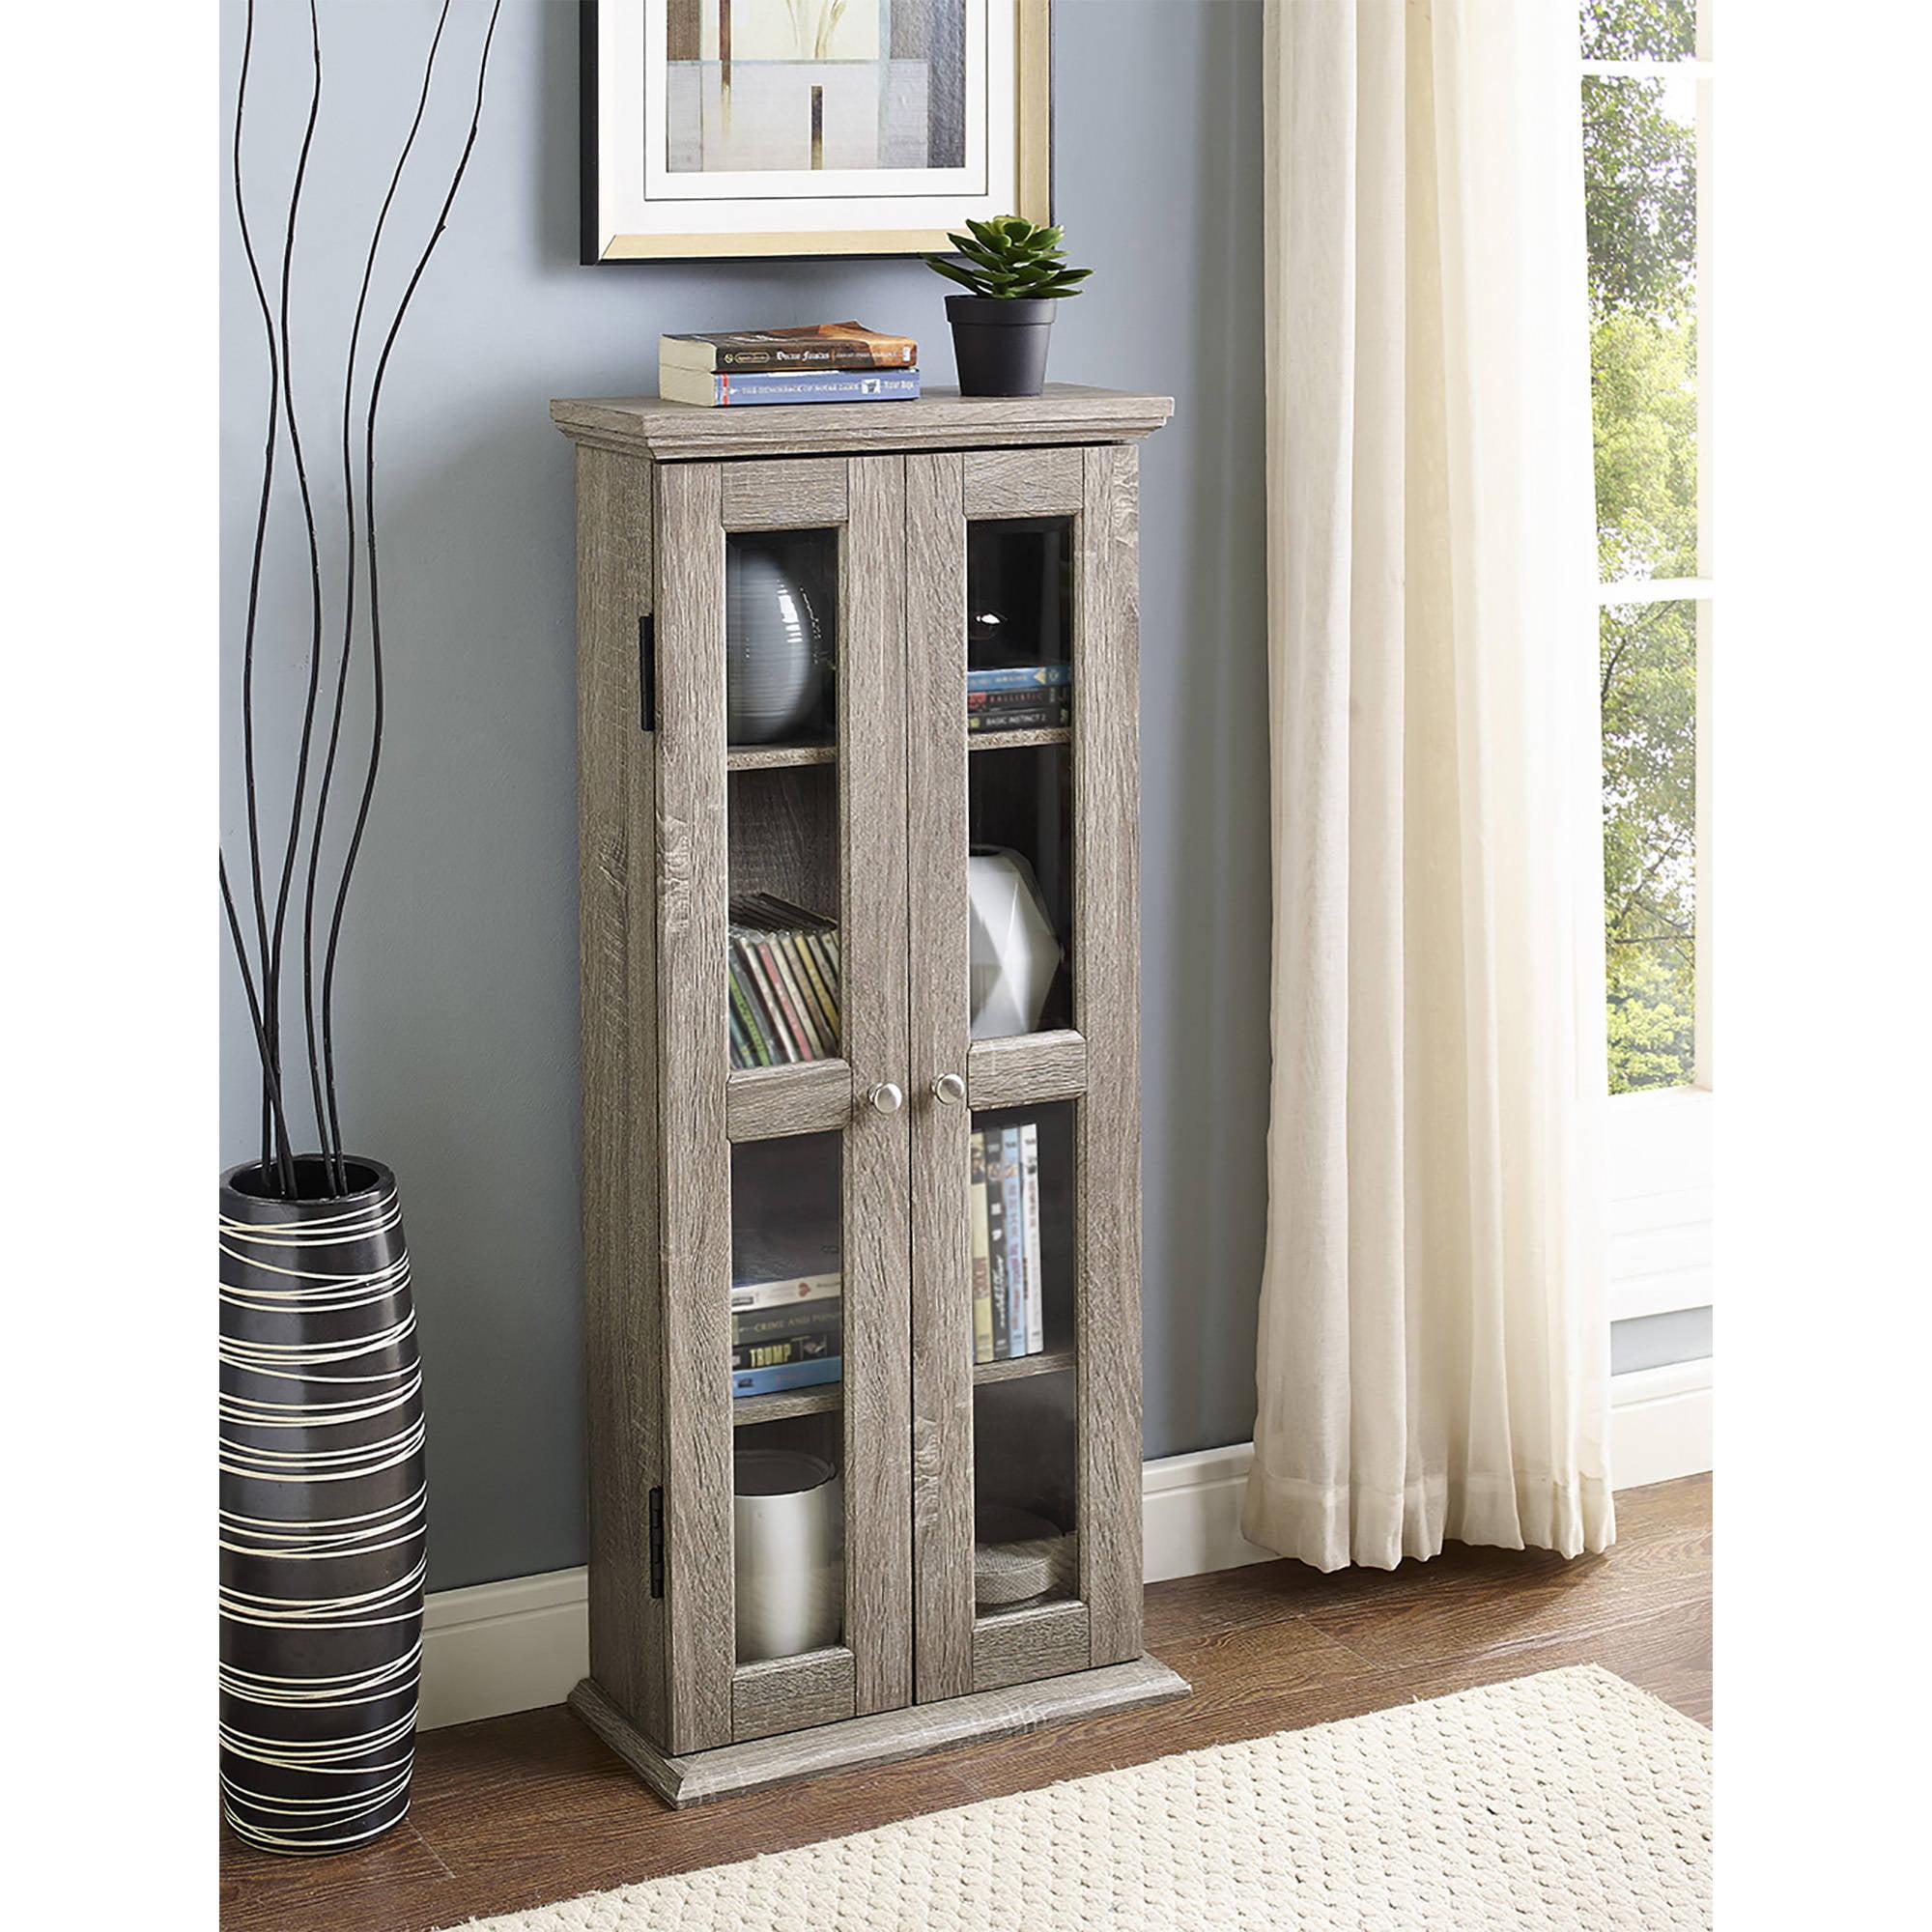 "Walker Edison 41"" Modern Wood Media Cabinet, Multiple Colors by Walker Edison Furniture Company"